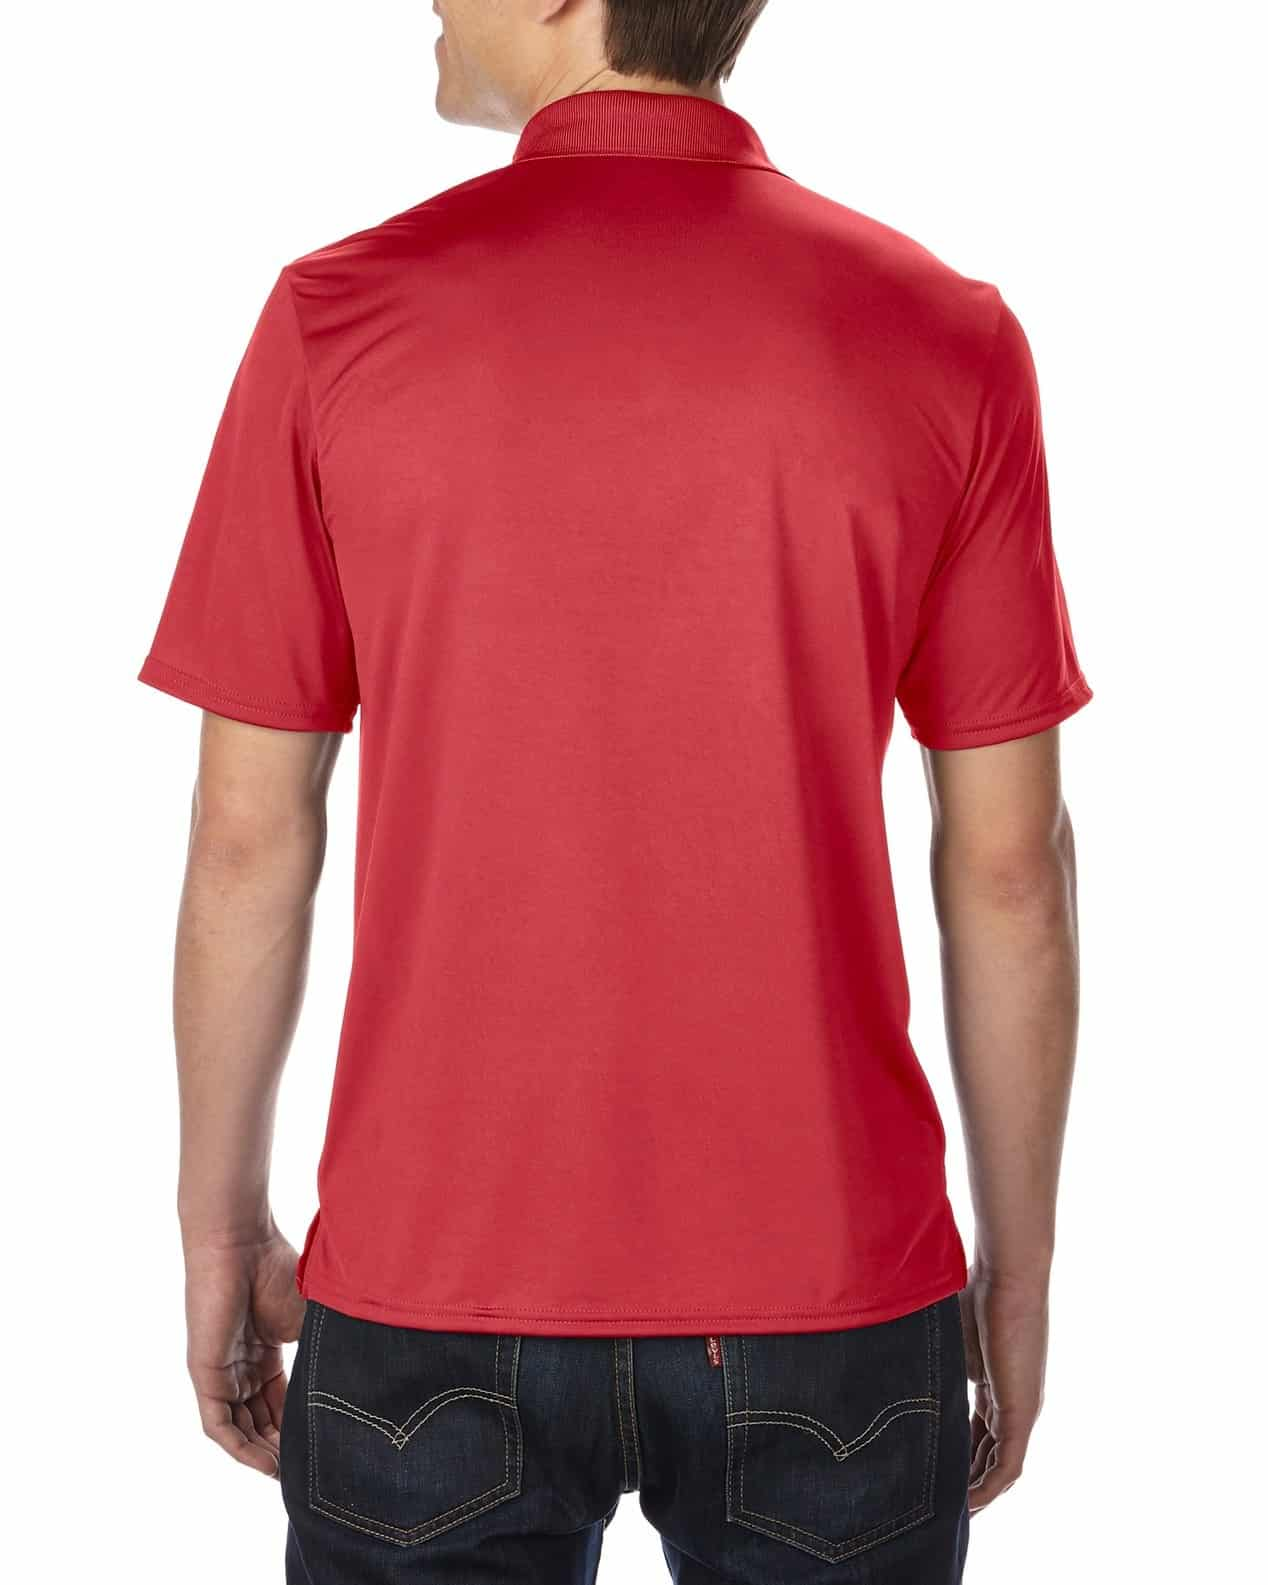 bb837c6b342 Performance Adult Jersey Sport Shirt   You ink it